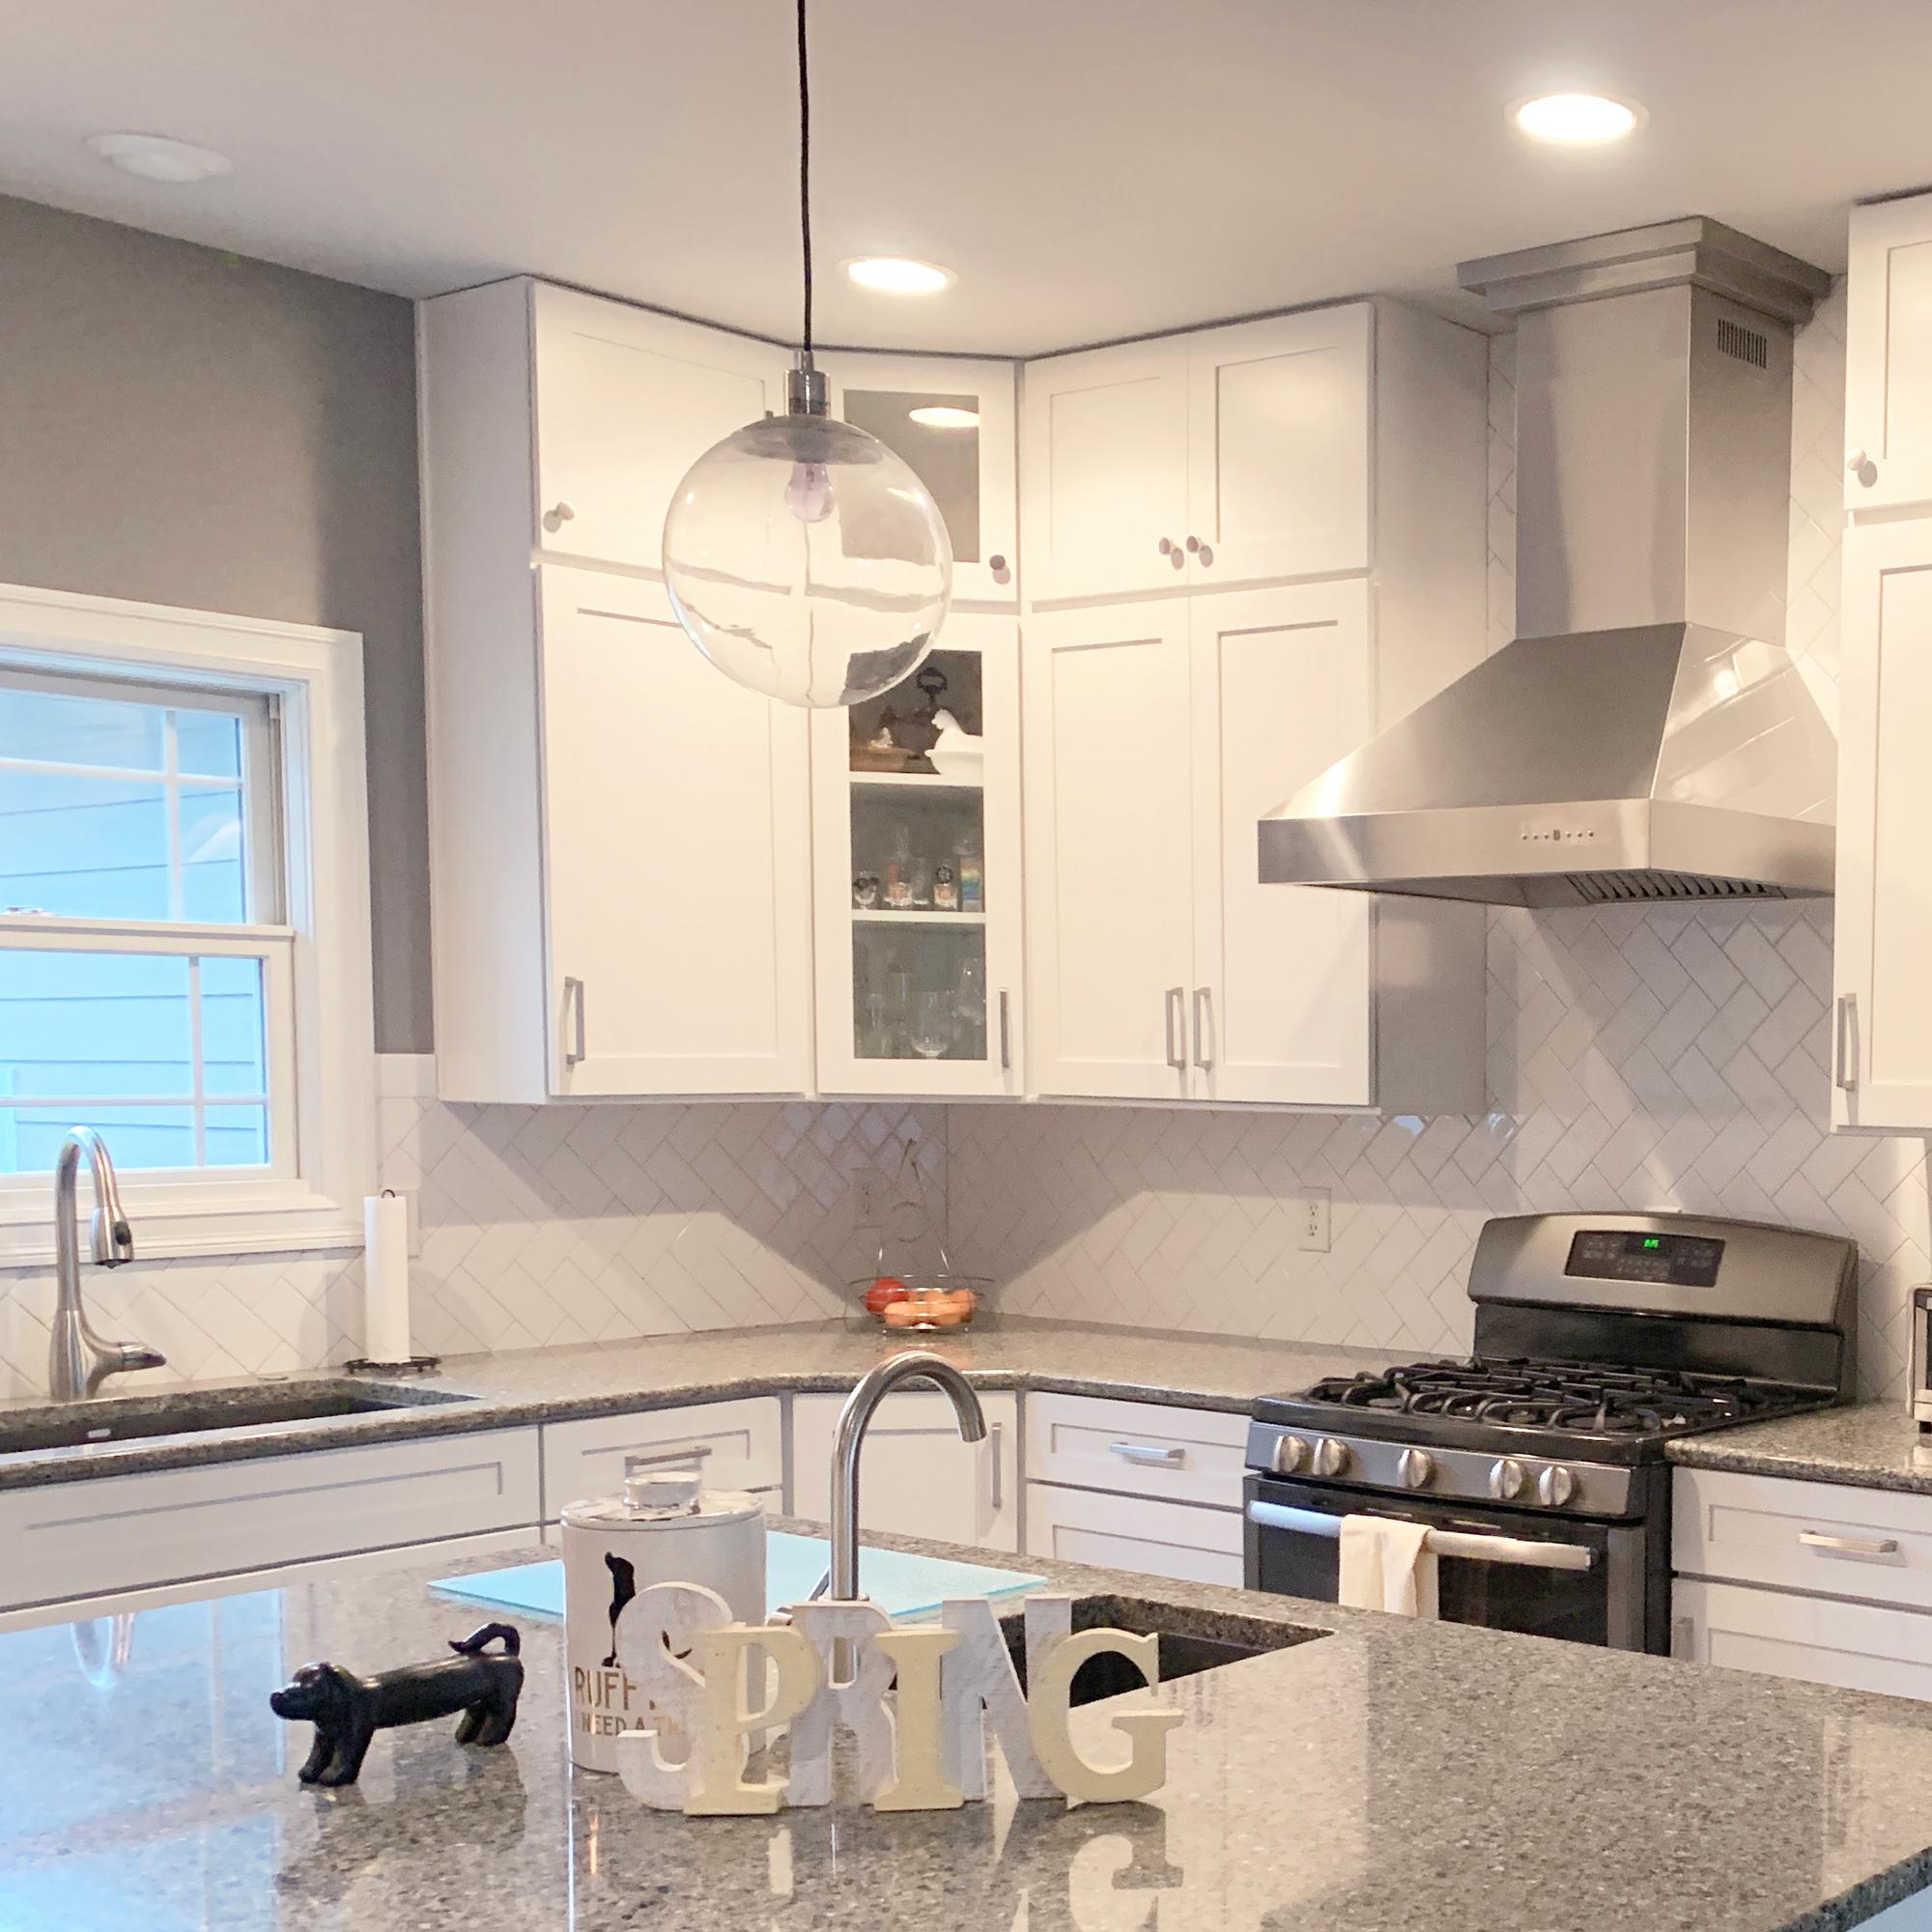 zline-stainless-steel-wall-mounted-range-hood-667-customer-kitchen-2 copy.jpg